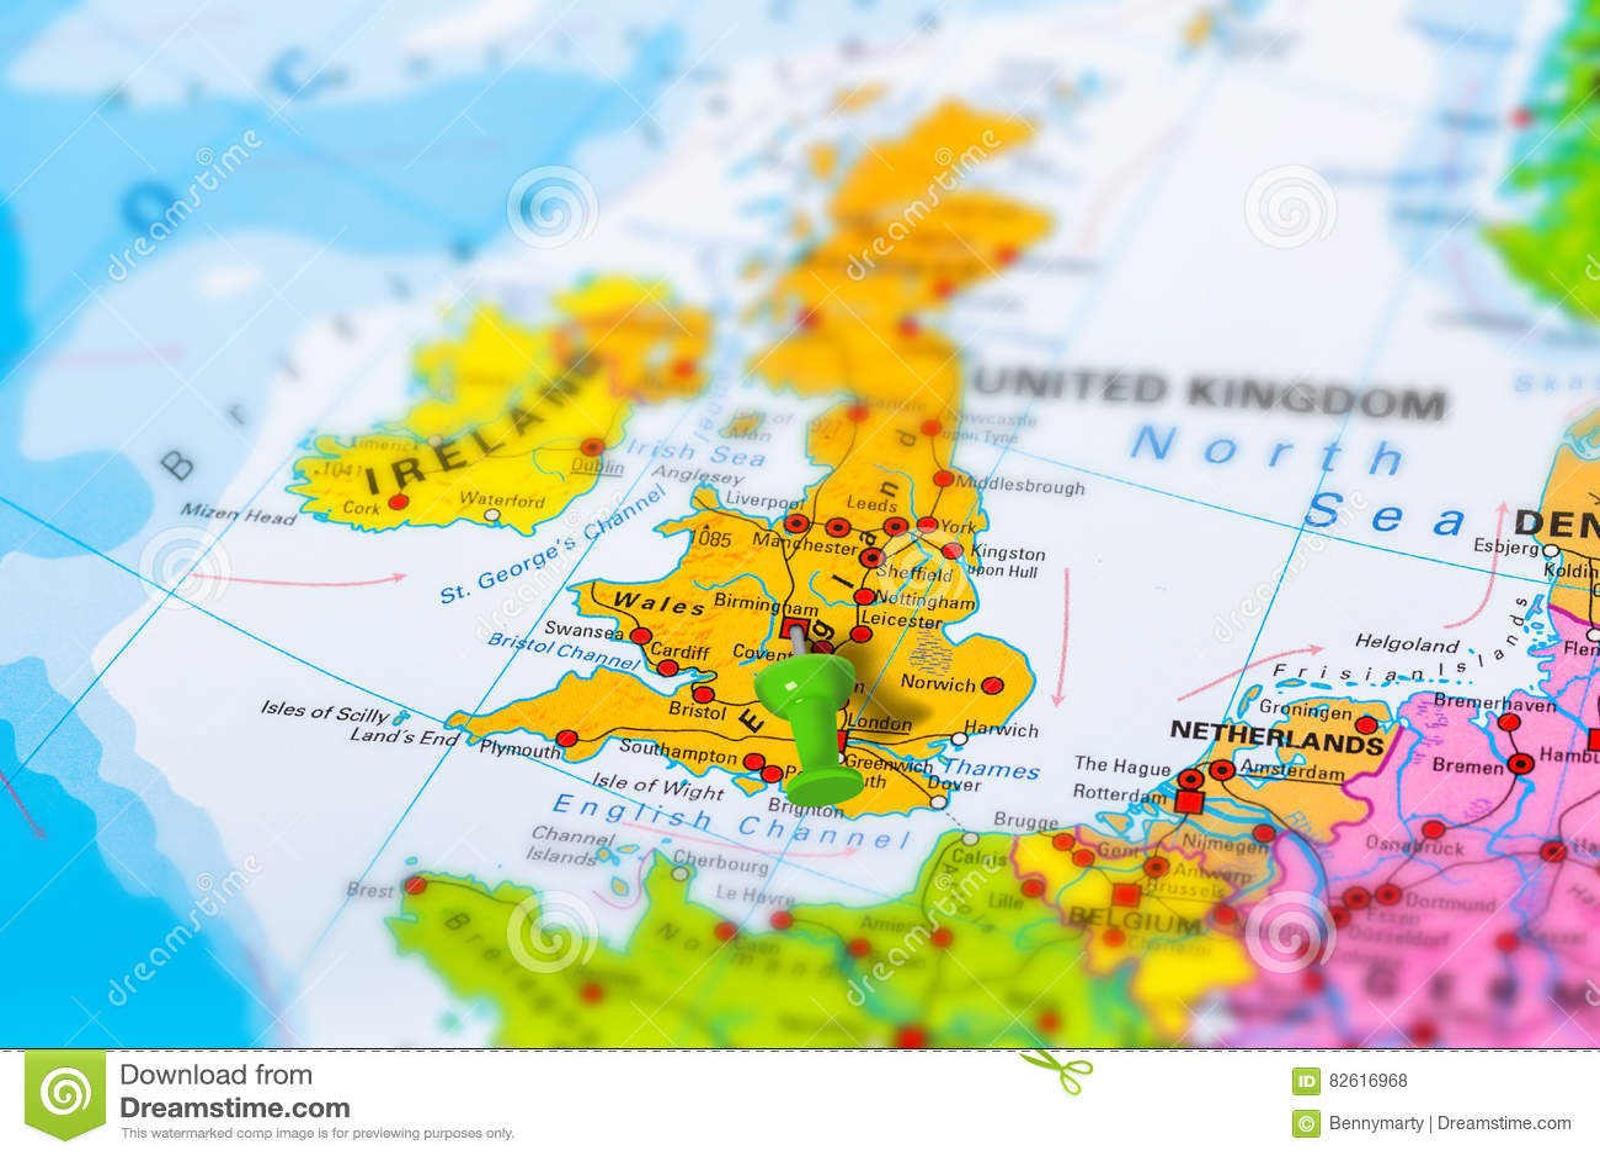 Map Of Uk Birmingham.Birmingham Uk Map Stock Photo Image Of Europe Landmark 82616968